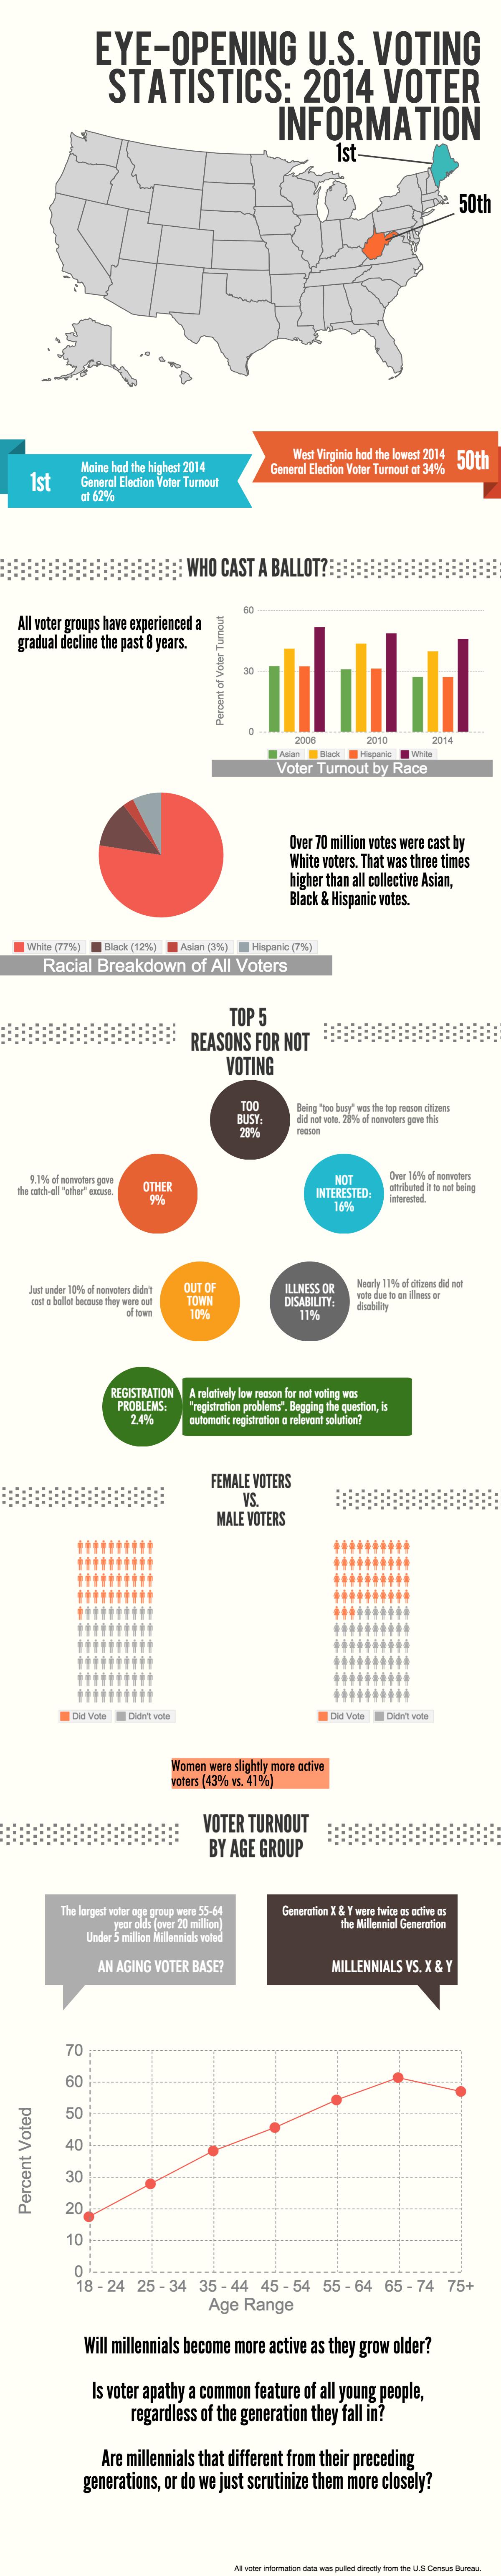 Voter-Information-Ballot-icitizen